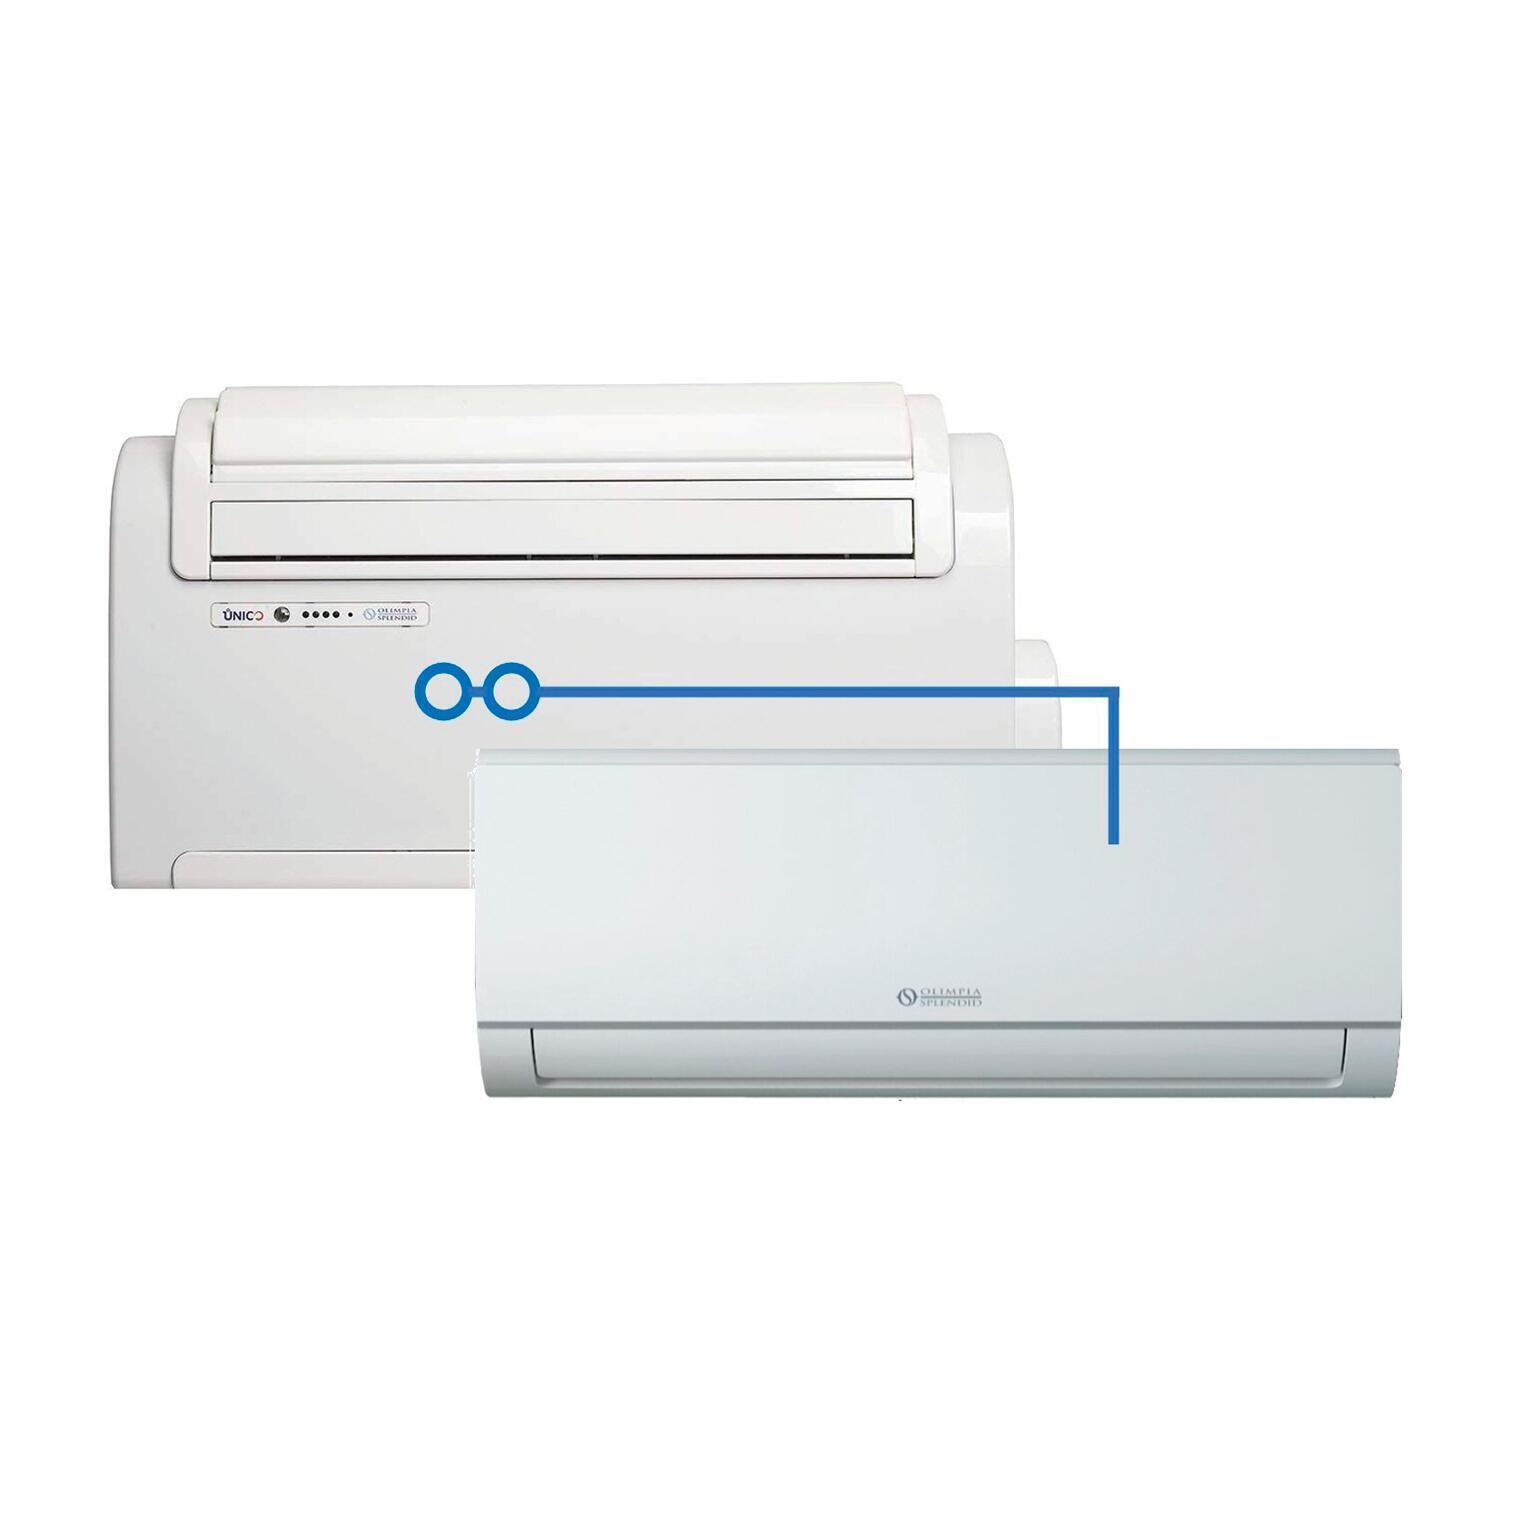 Climatizzatore dualsplit OLIMPIA SPLENDID Unico 8530 BTU - 1